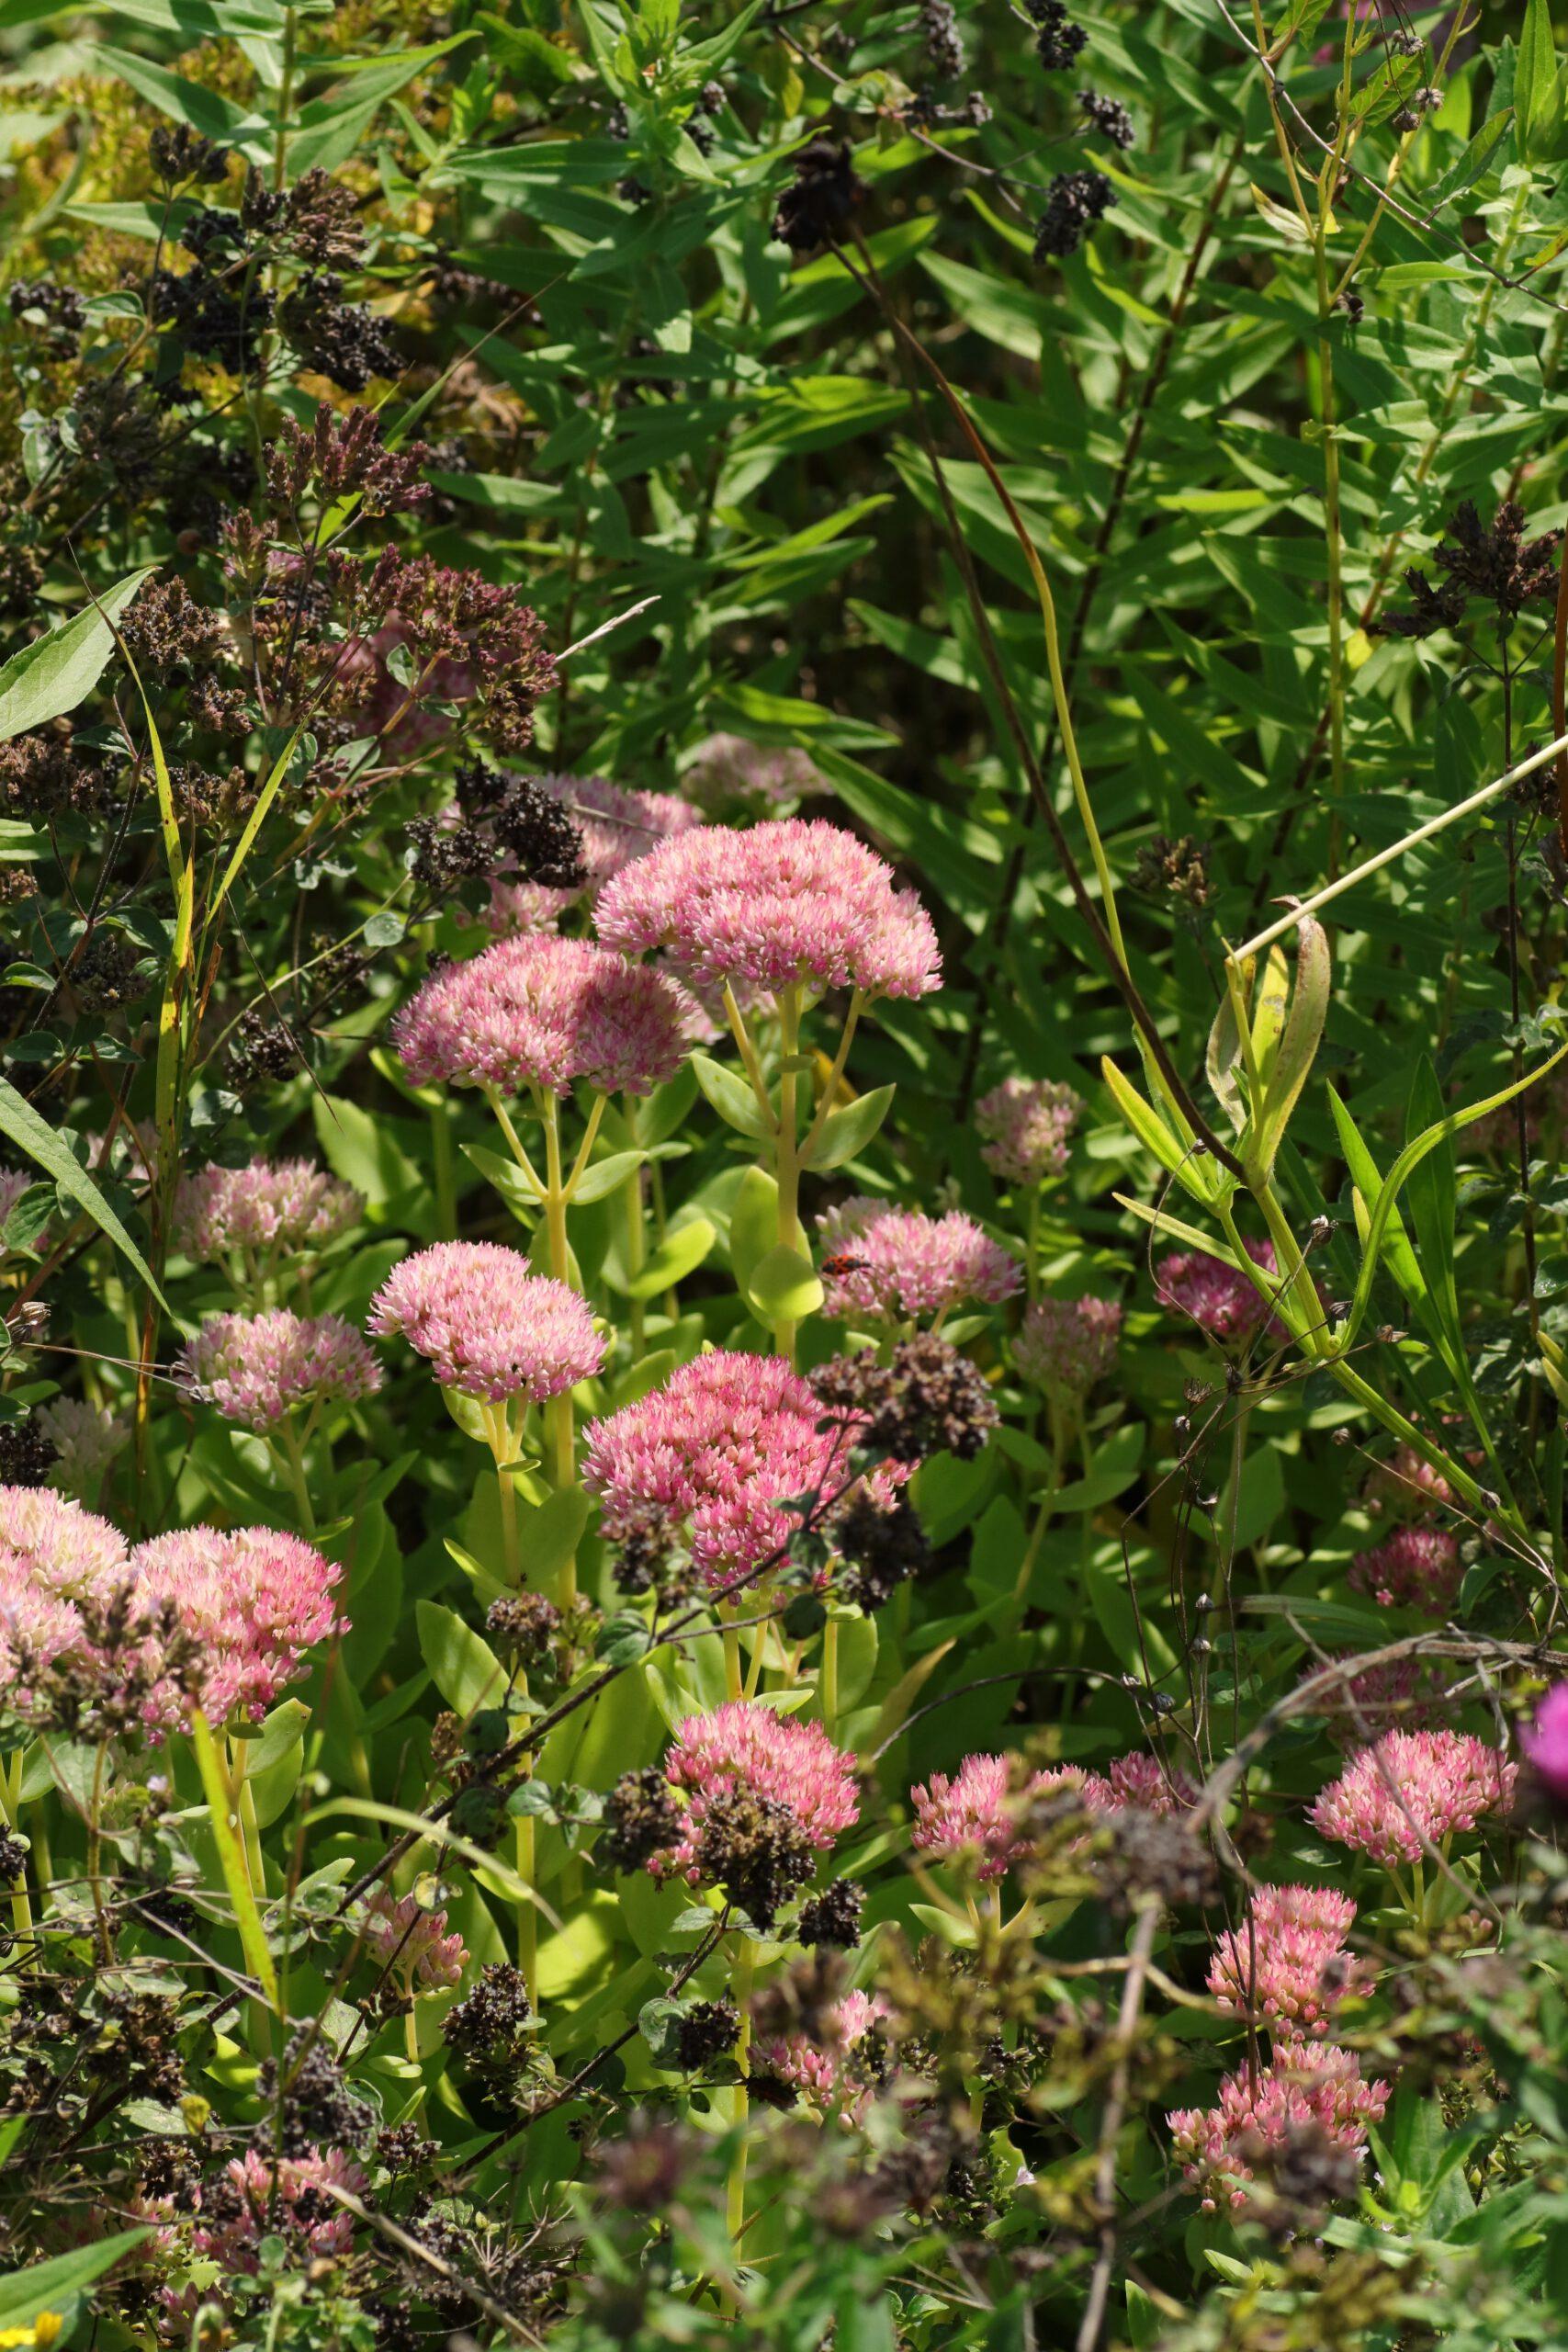 Fetthenne - Gesamte Pflanze